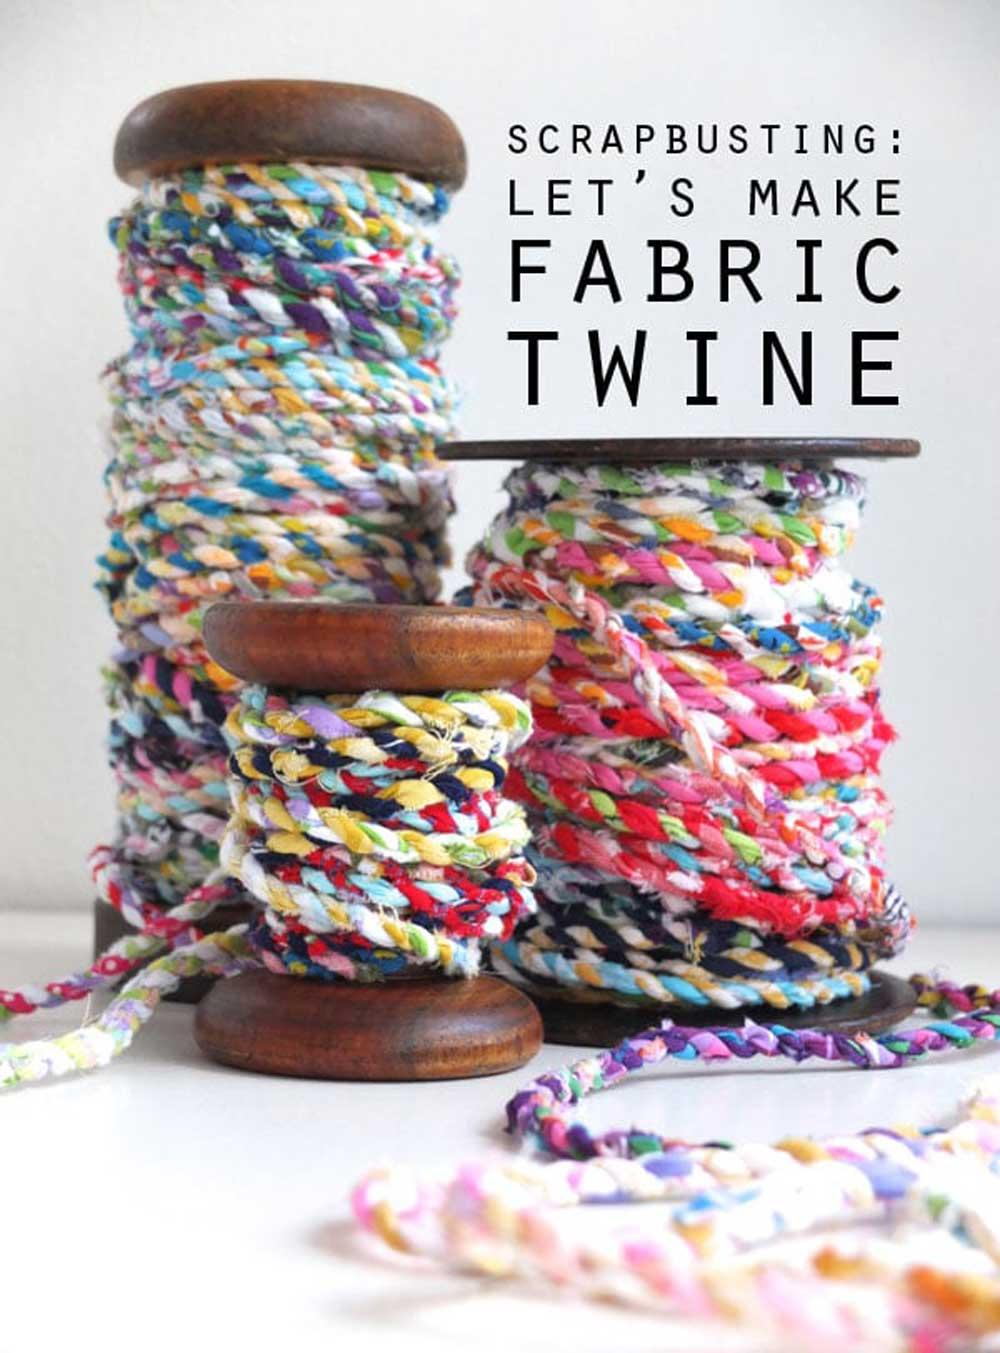 How to make Fabric Twine